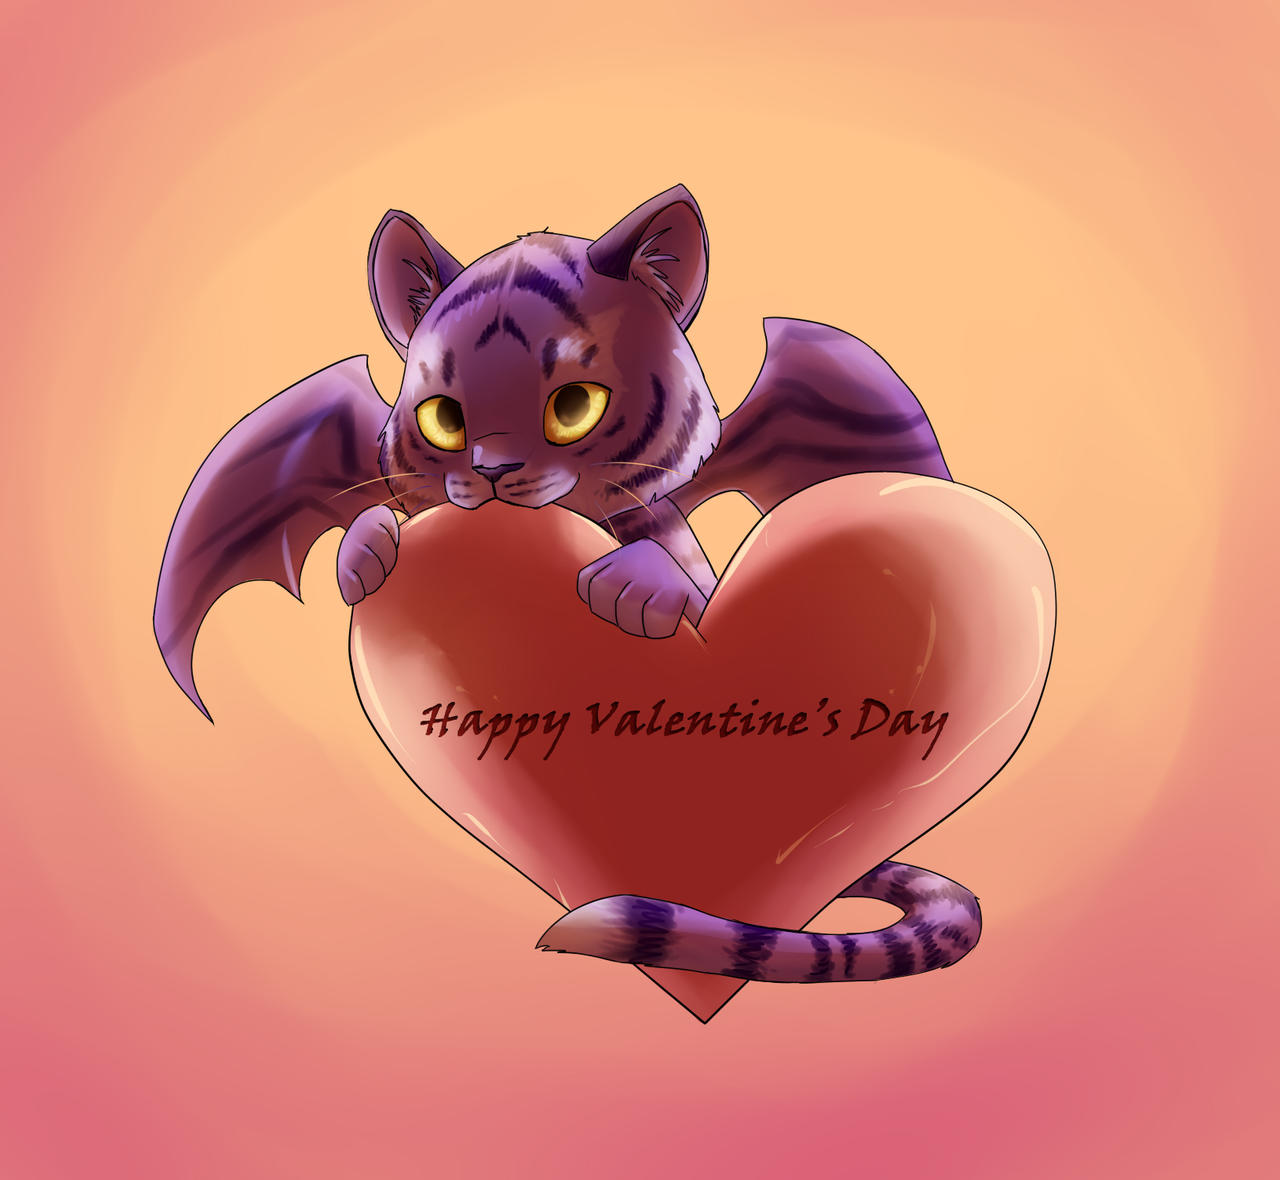 Happy Valentine's Day! by JazzTheTiger